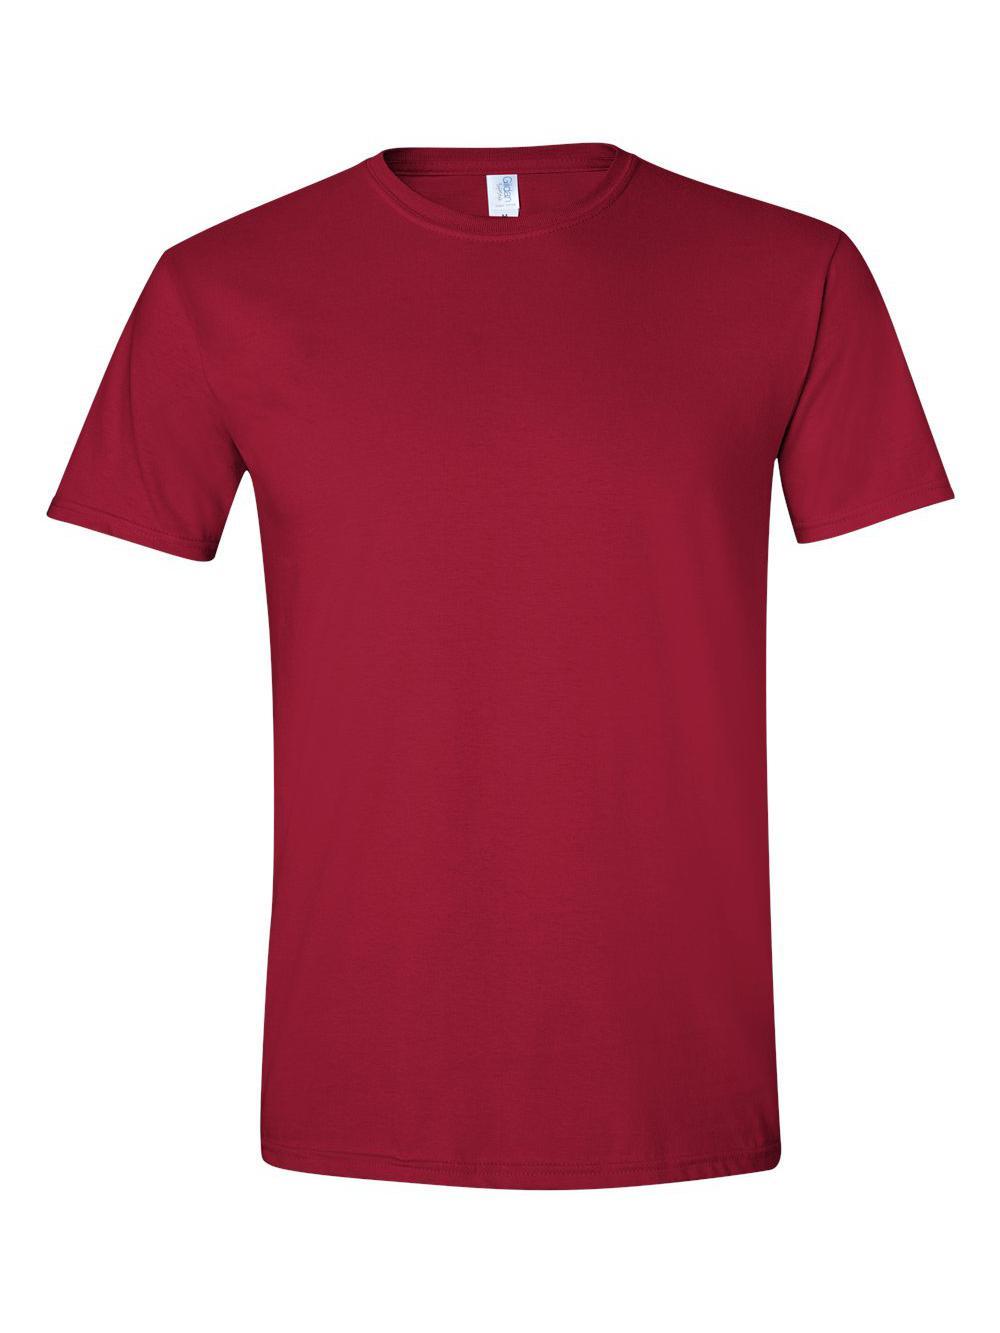 Gildan-Softstyle-T-Shirt-64000 thumbnail 24